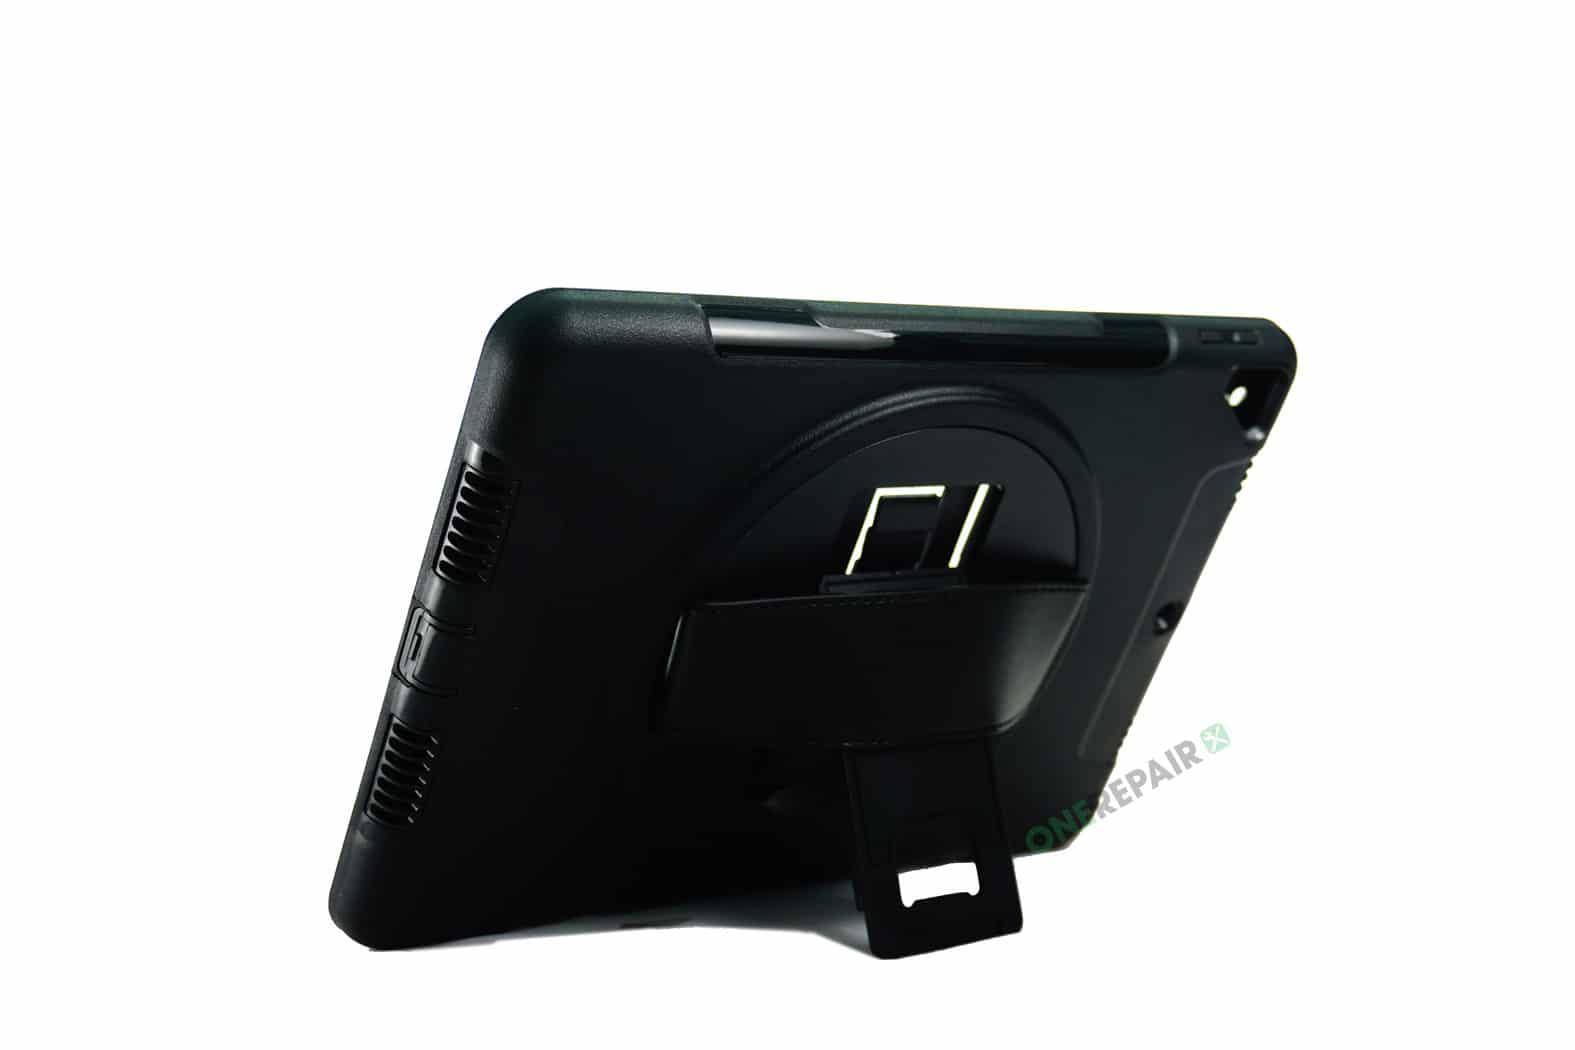 353576-001_iPad_Pro_10_Air_3_360_3-1_cover_Hardcase_Sort_OneRepair_00003